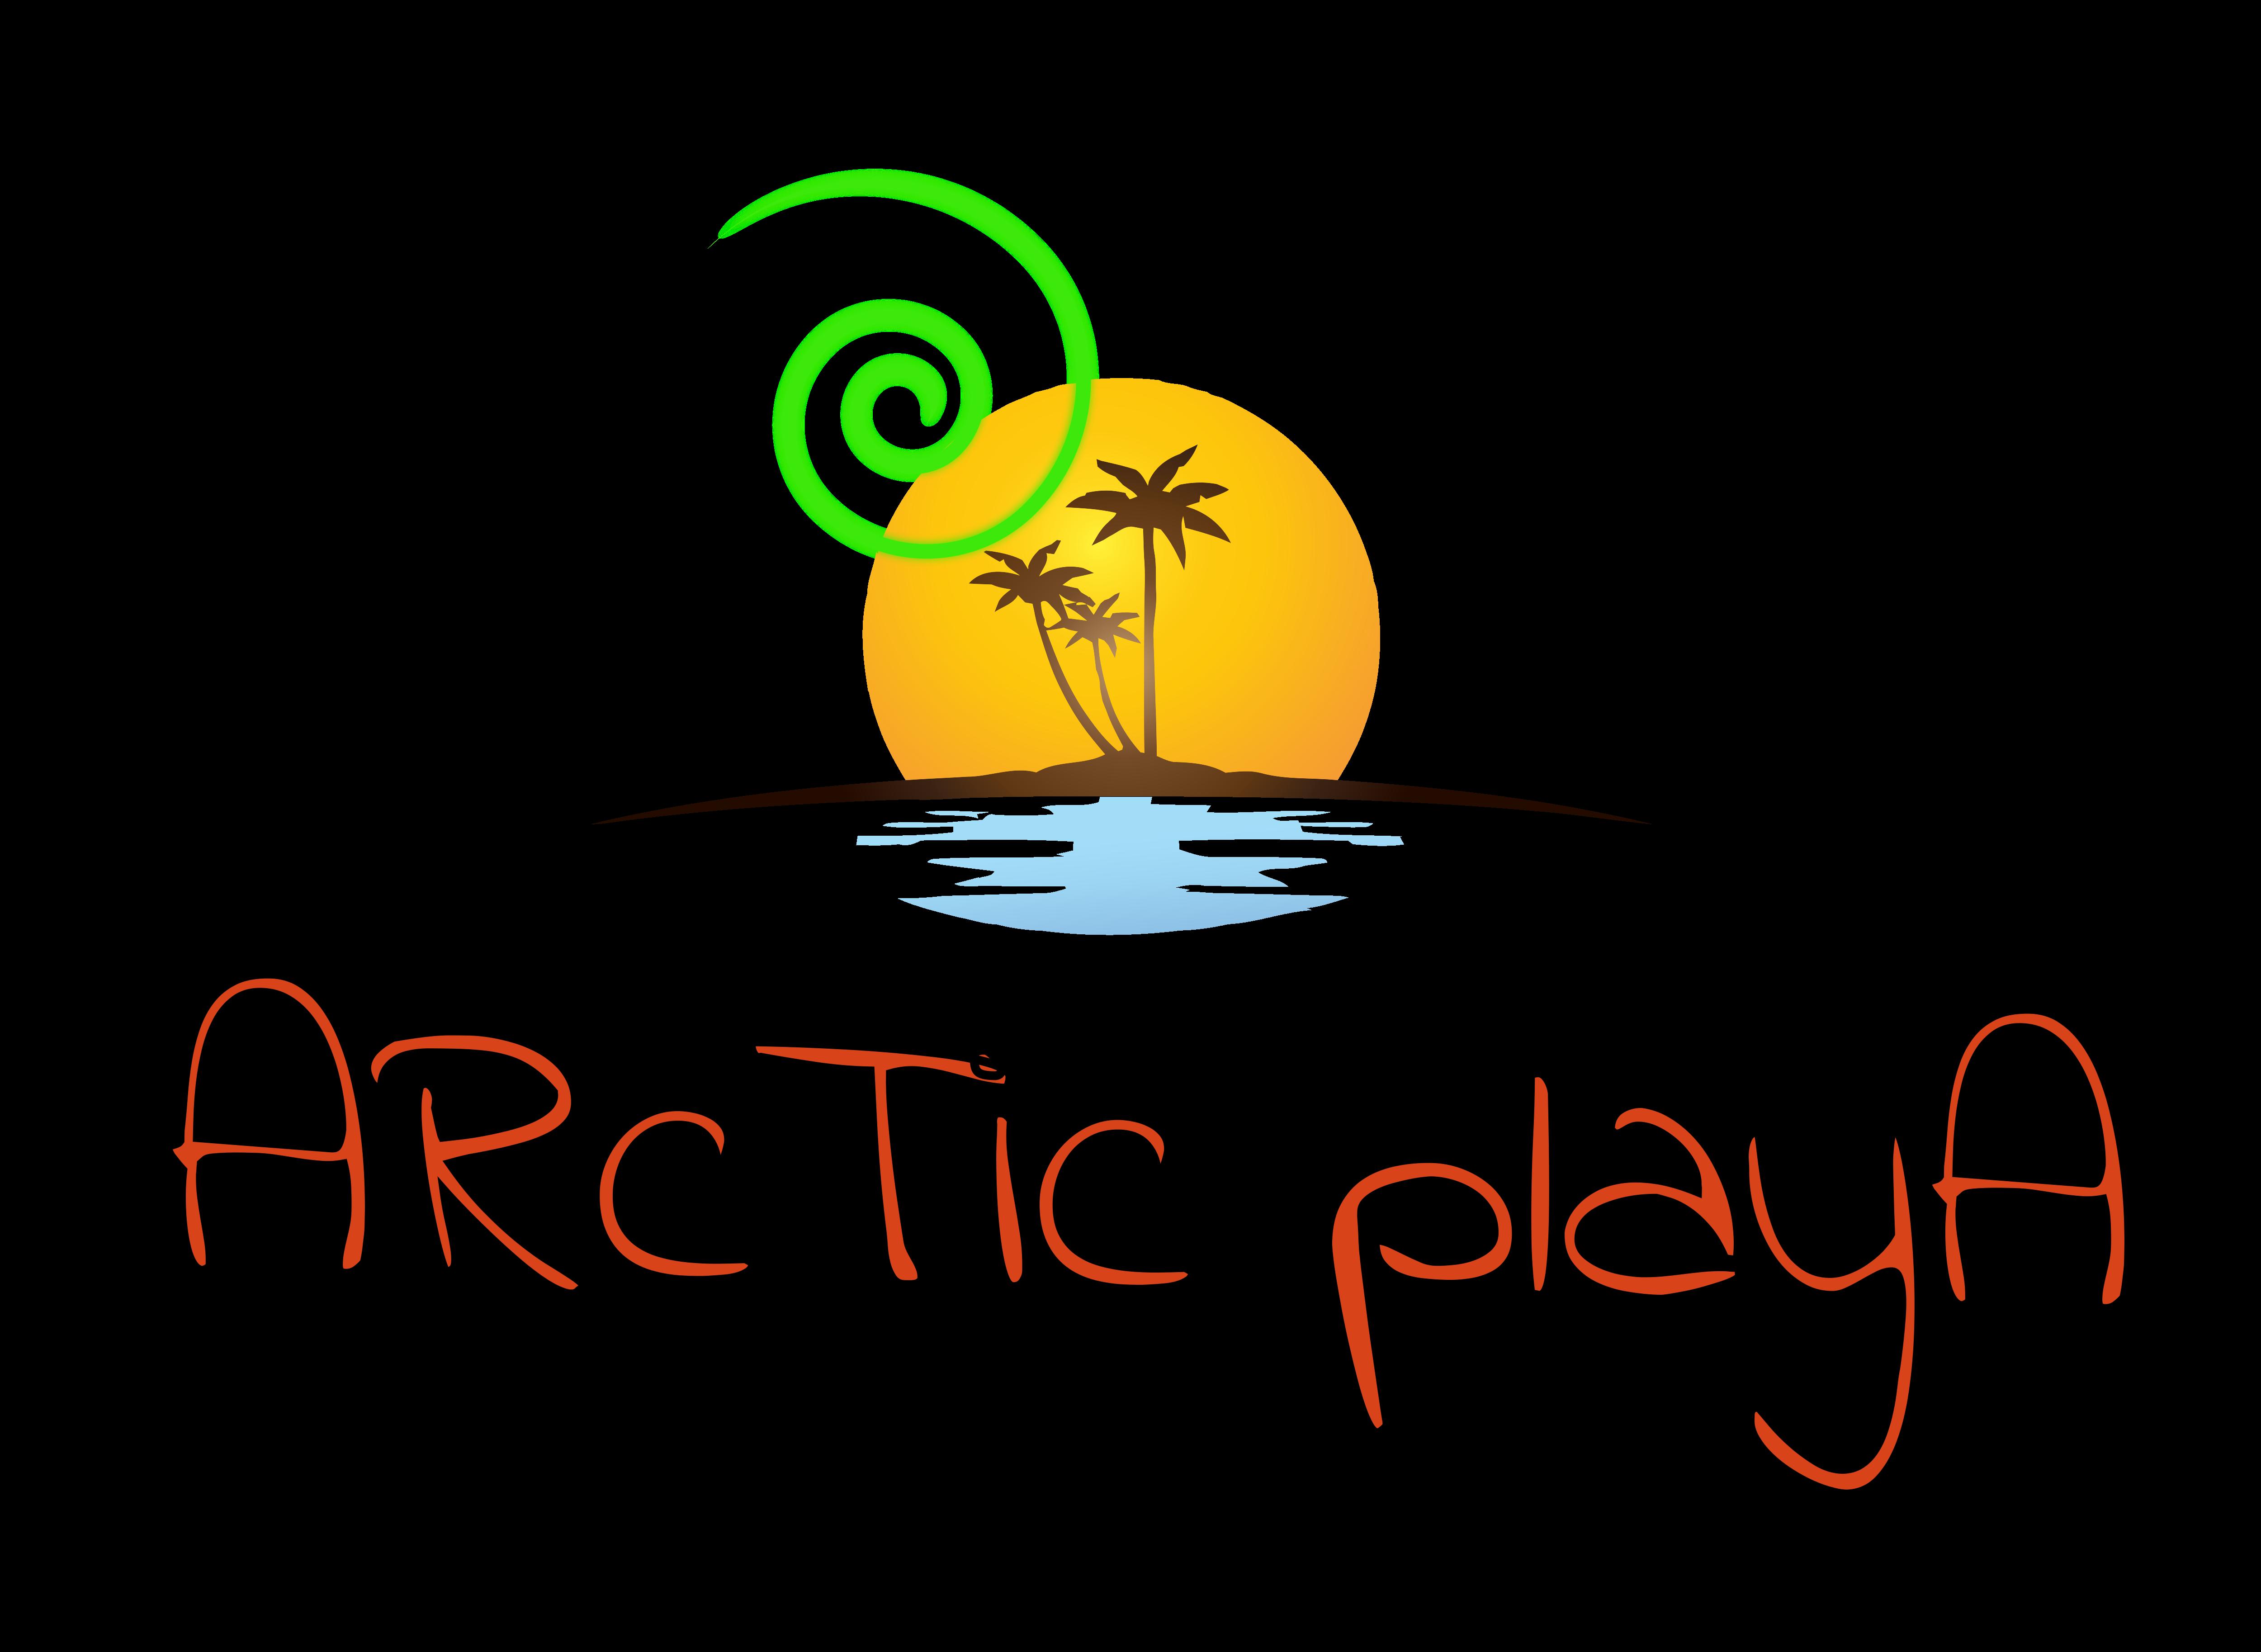 ARcTic playA